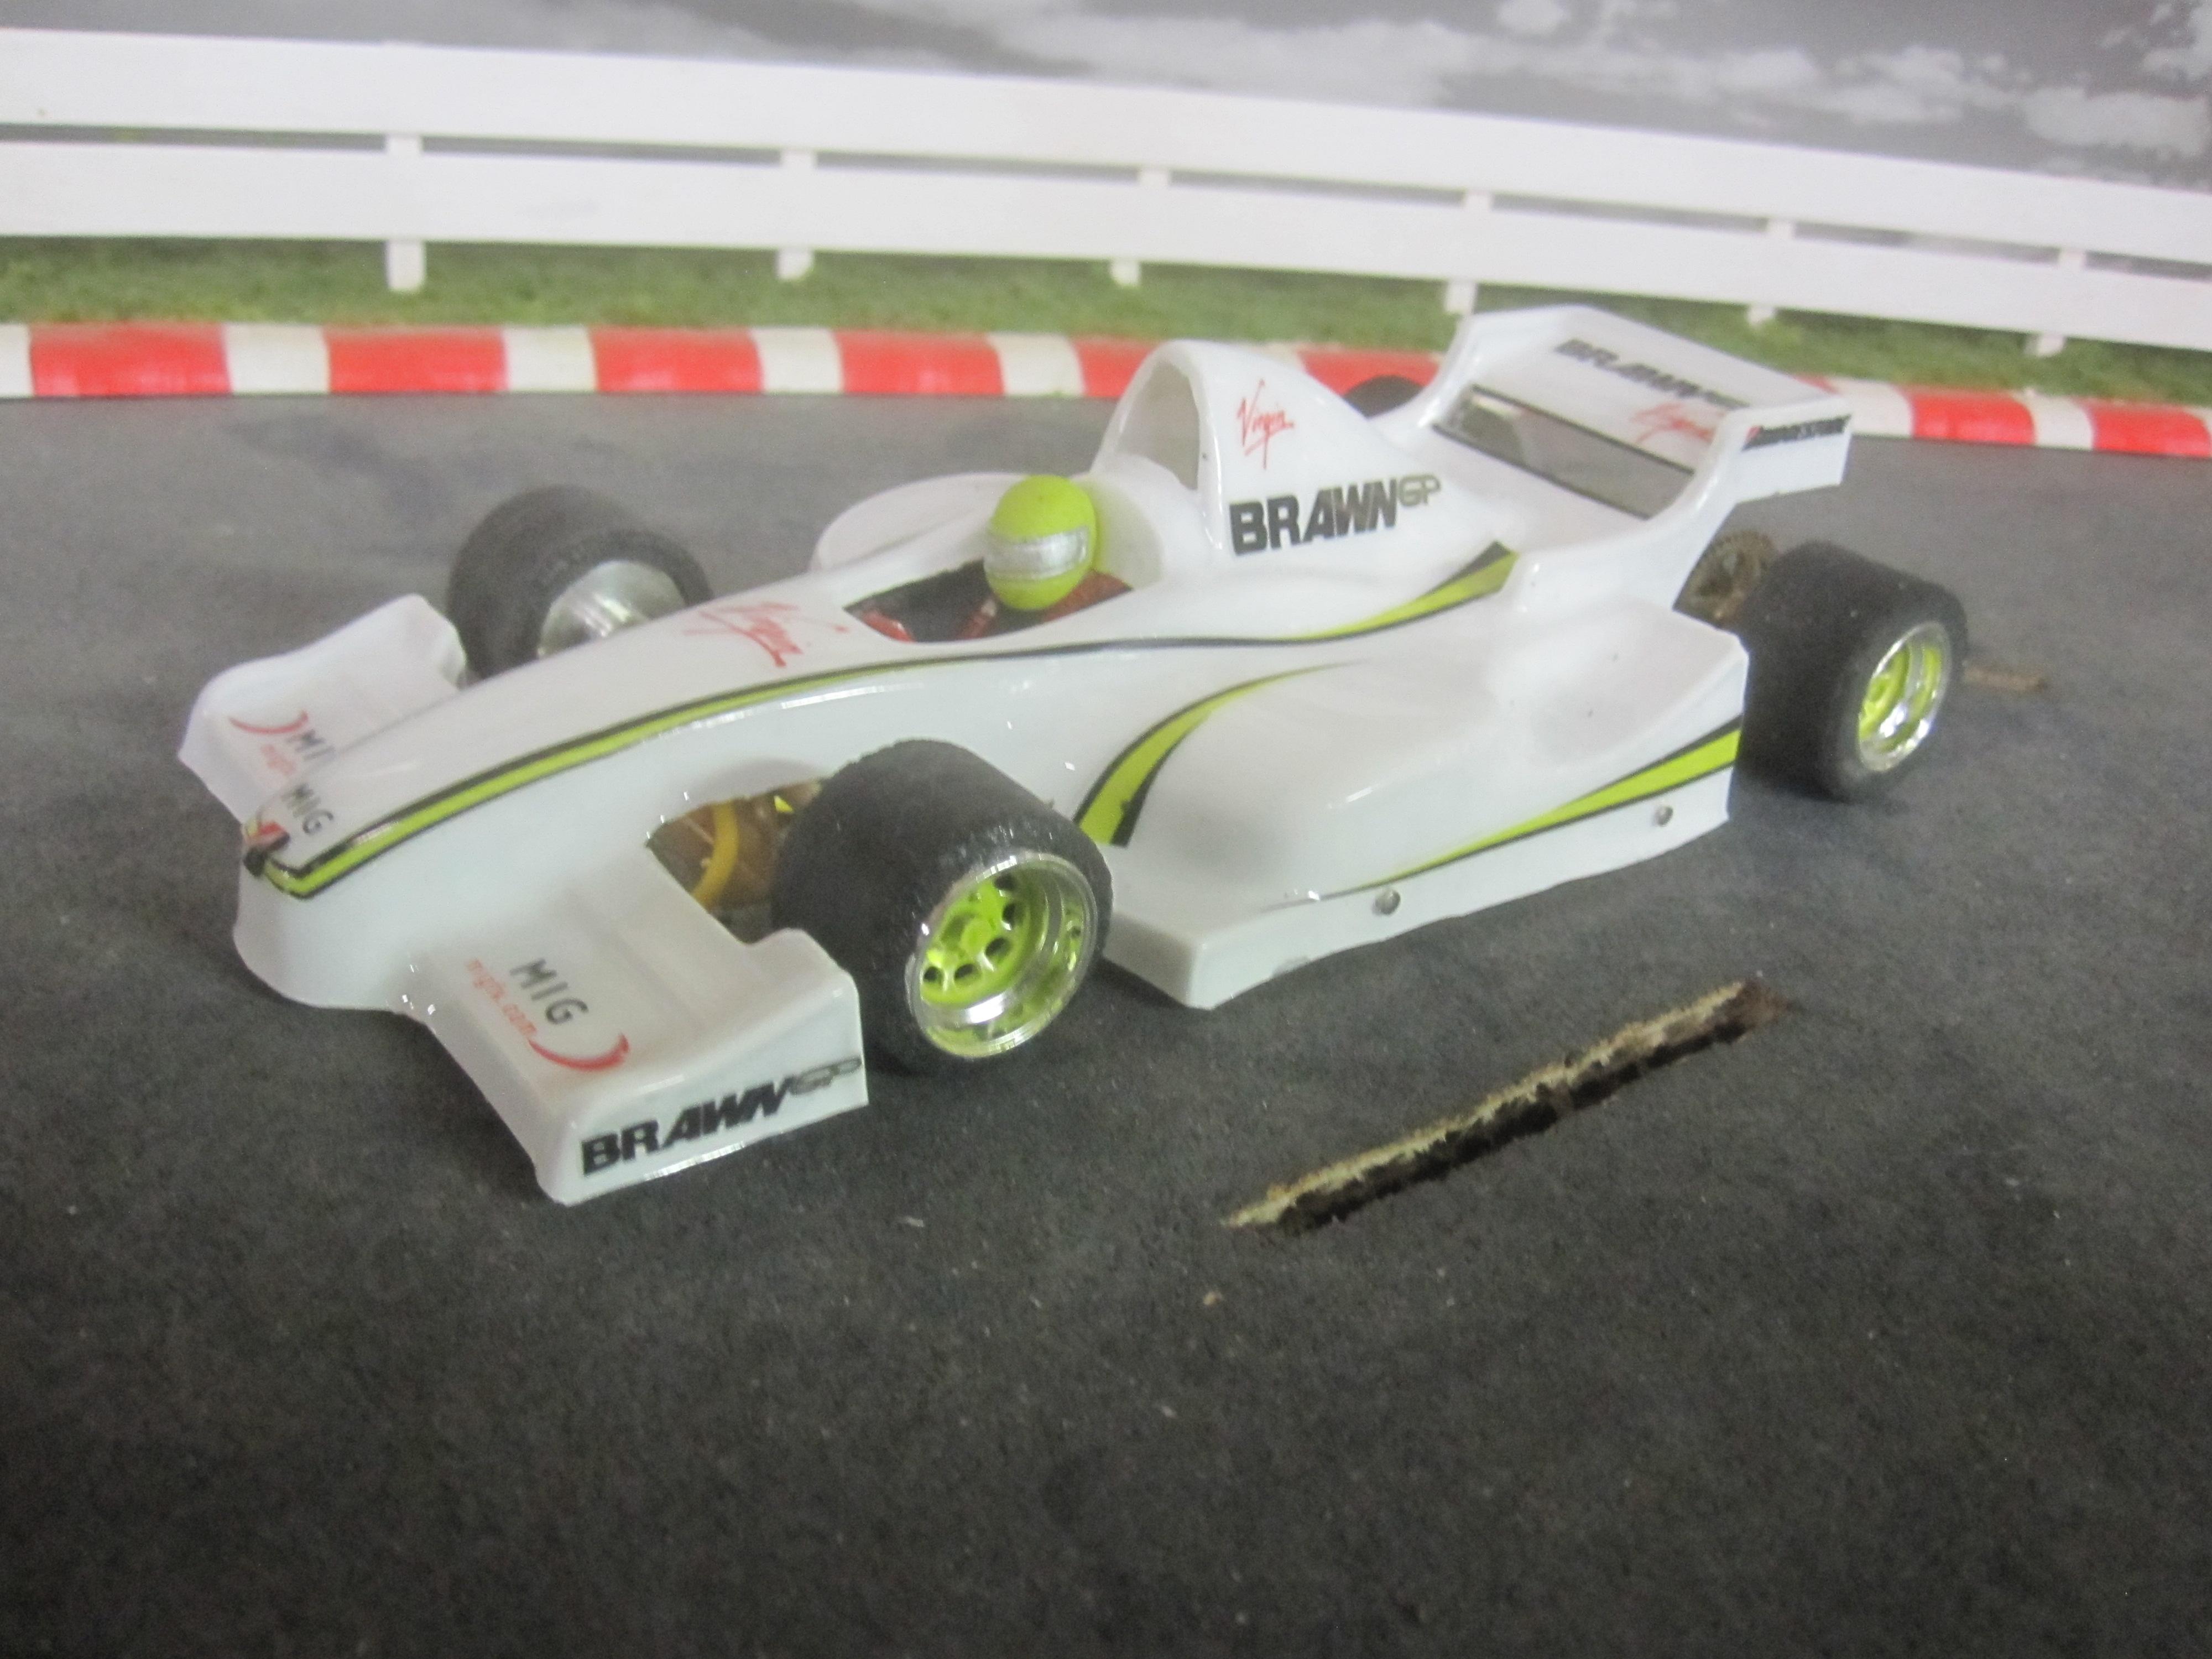 http://www.naste.org/members/bill/RaceResultsICa.jpg